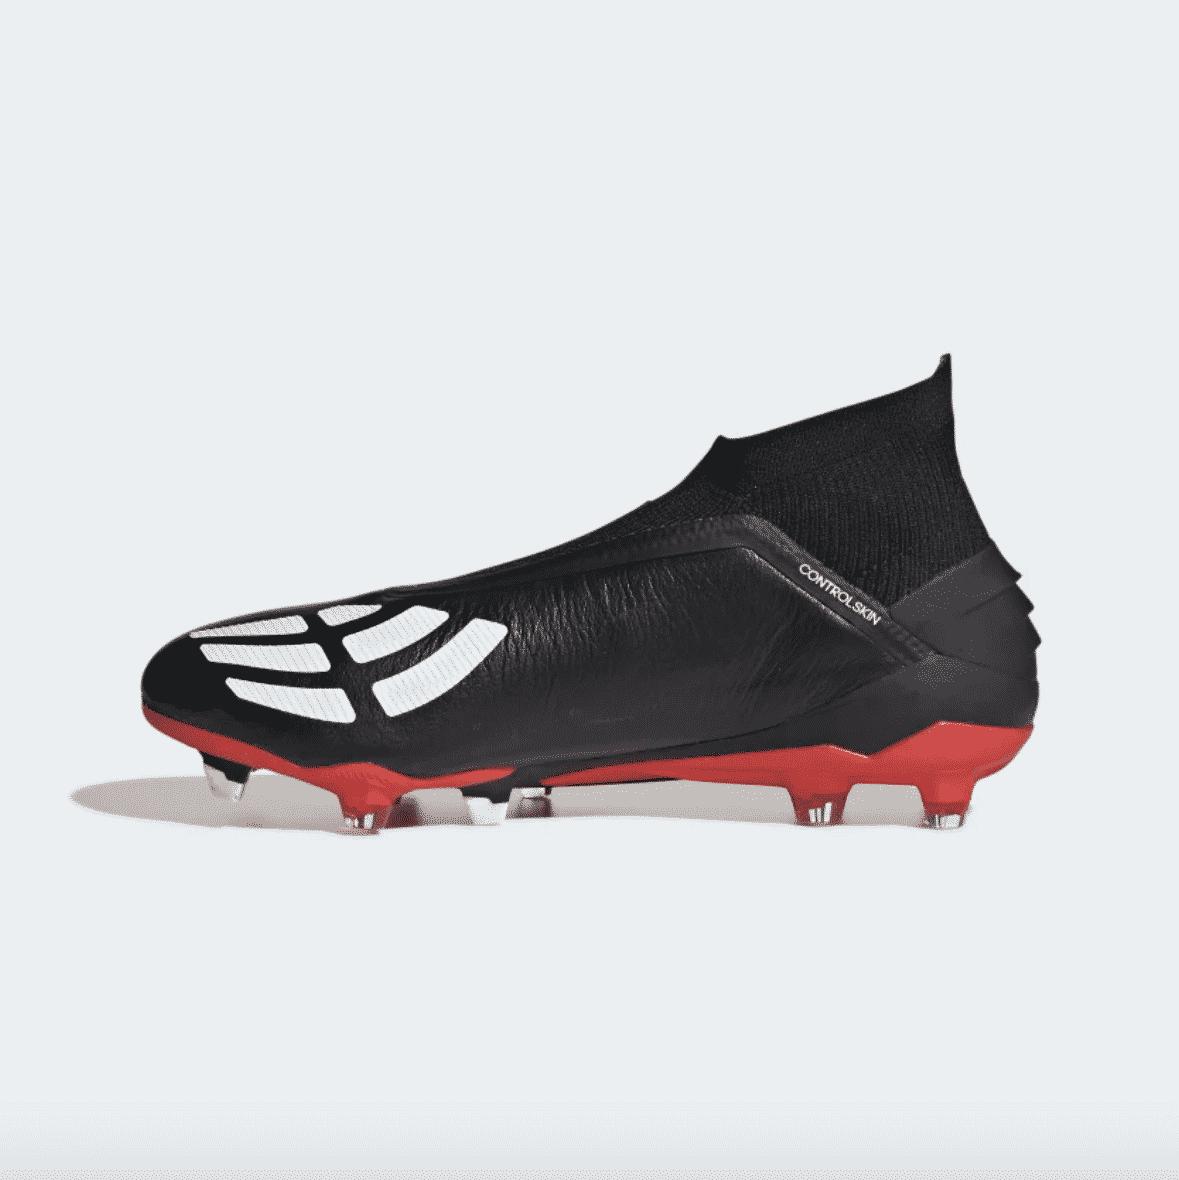 adidas-predator-19+-reedition-predator-mania-noir-6